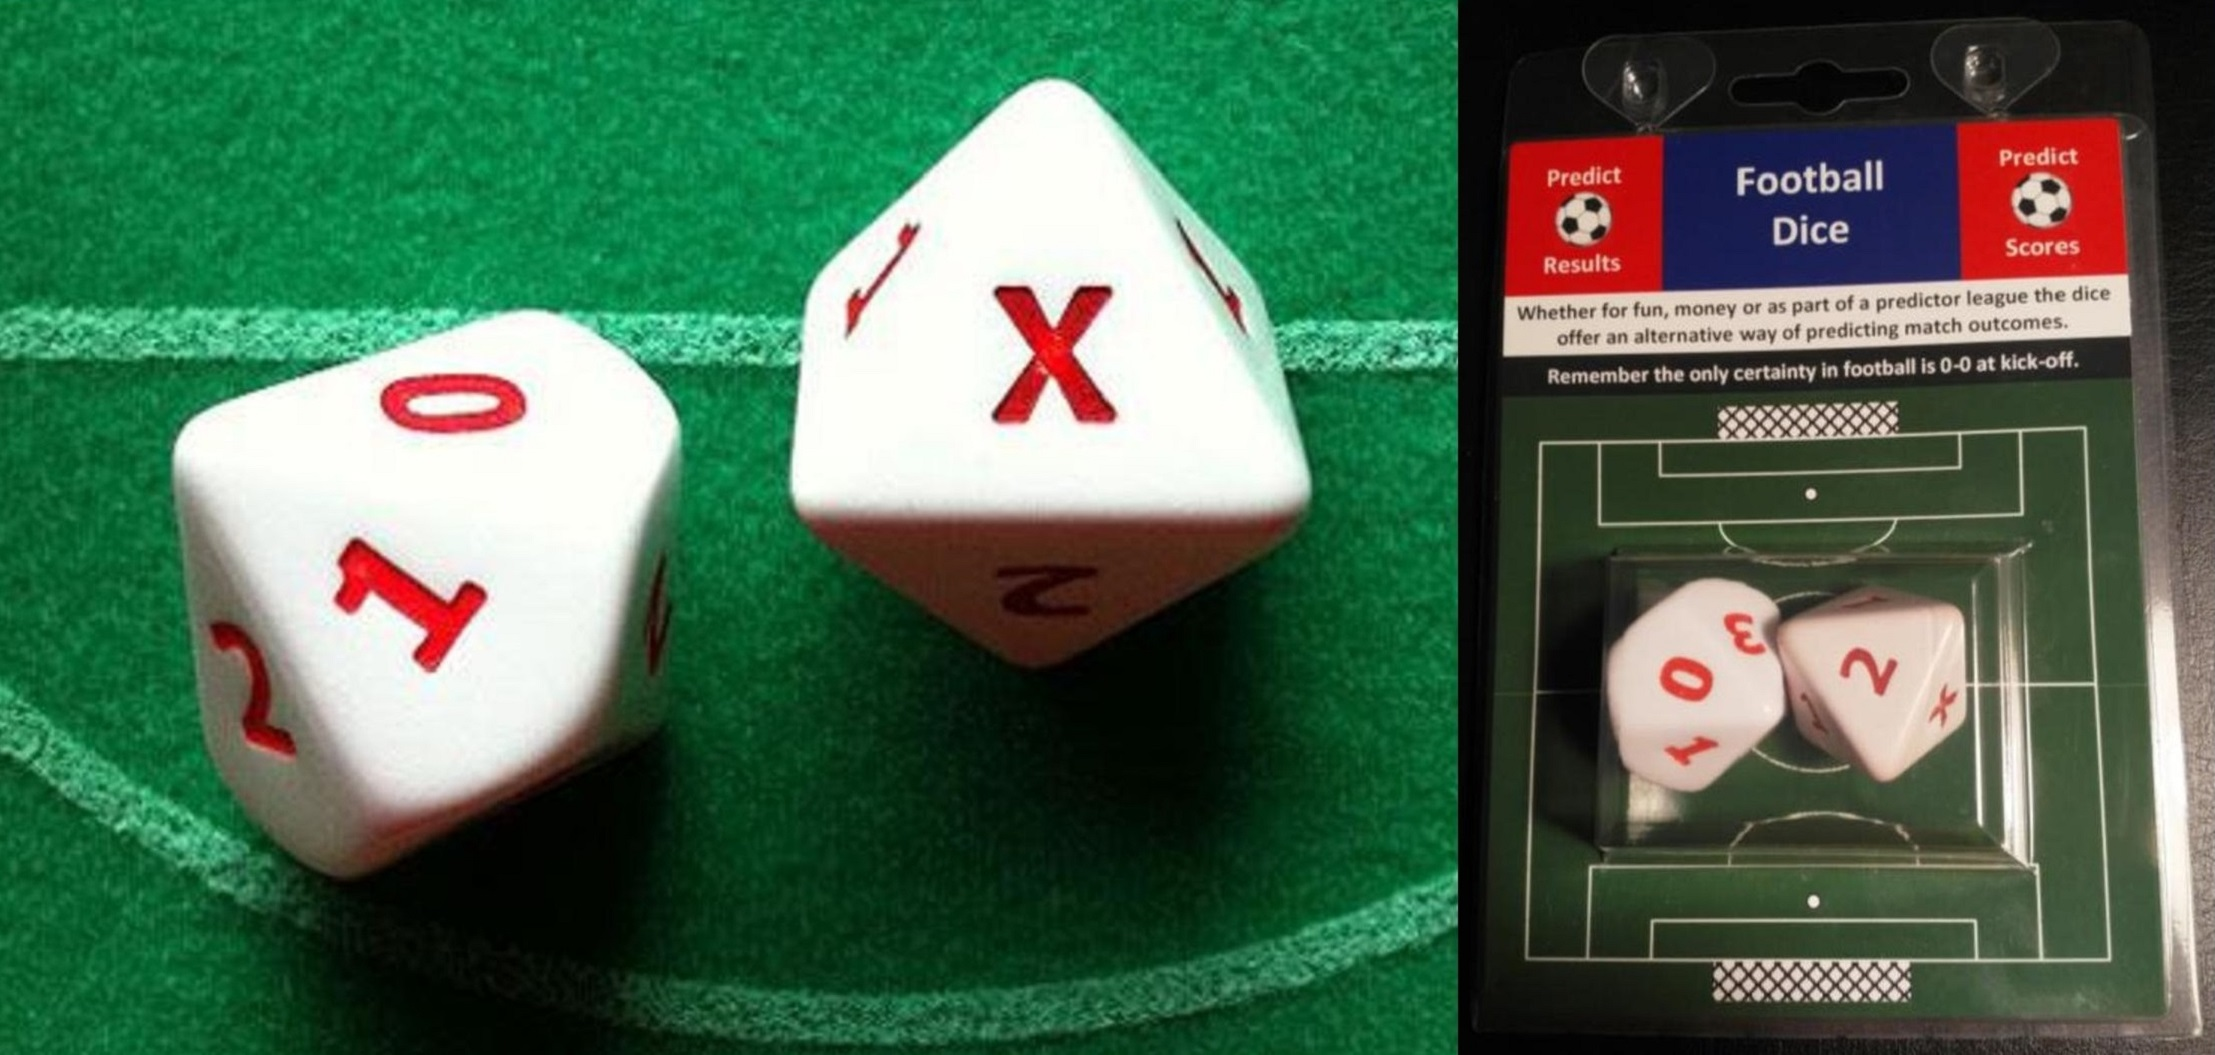 Football Results Predictor Dice -